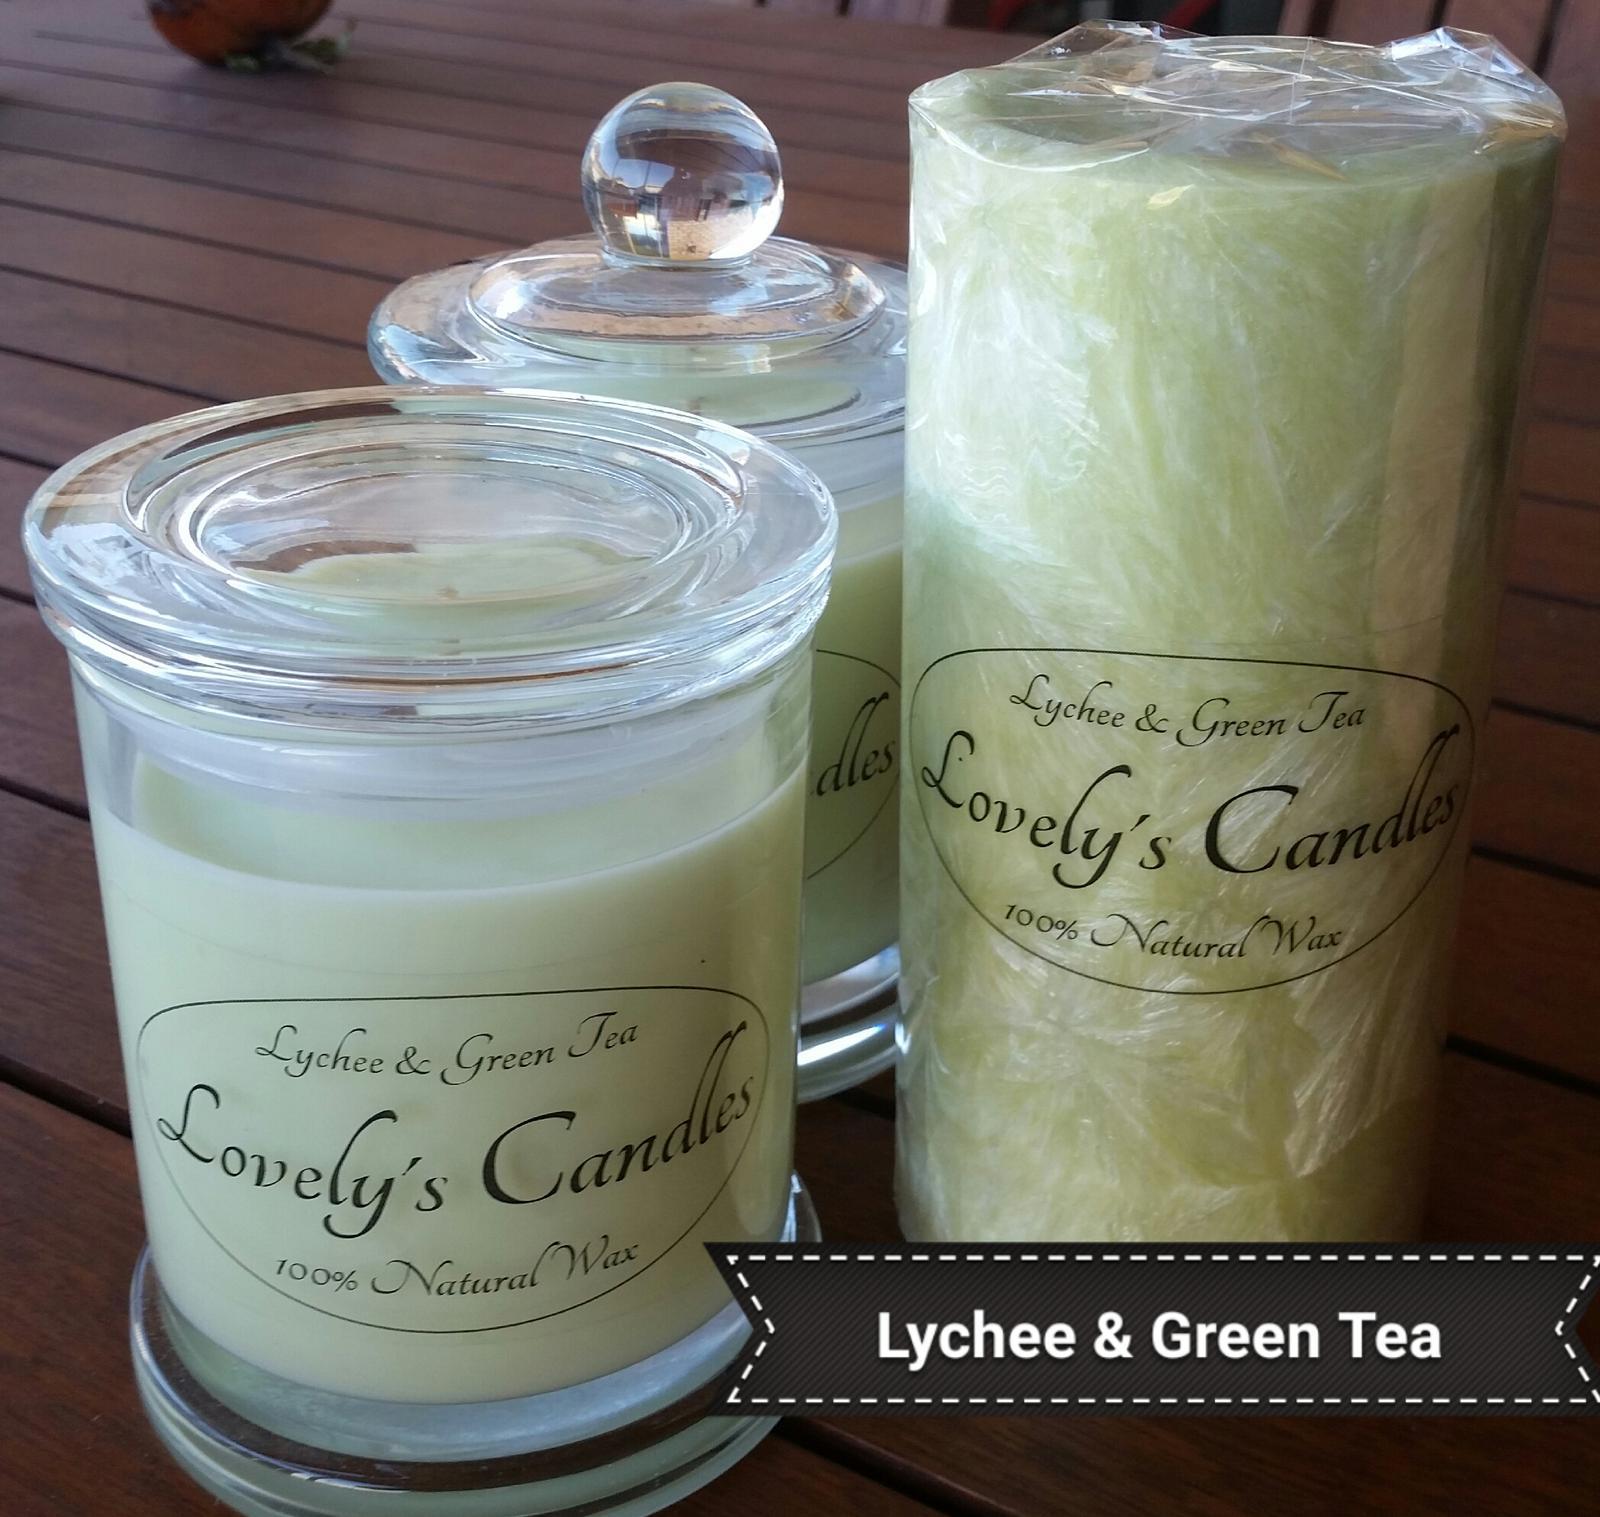 Lychee & Green Tea